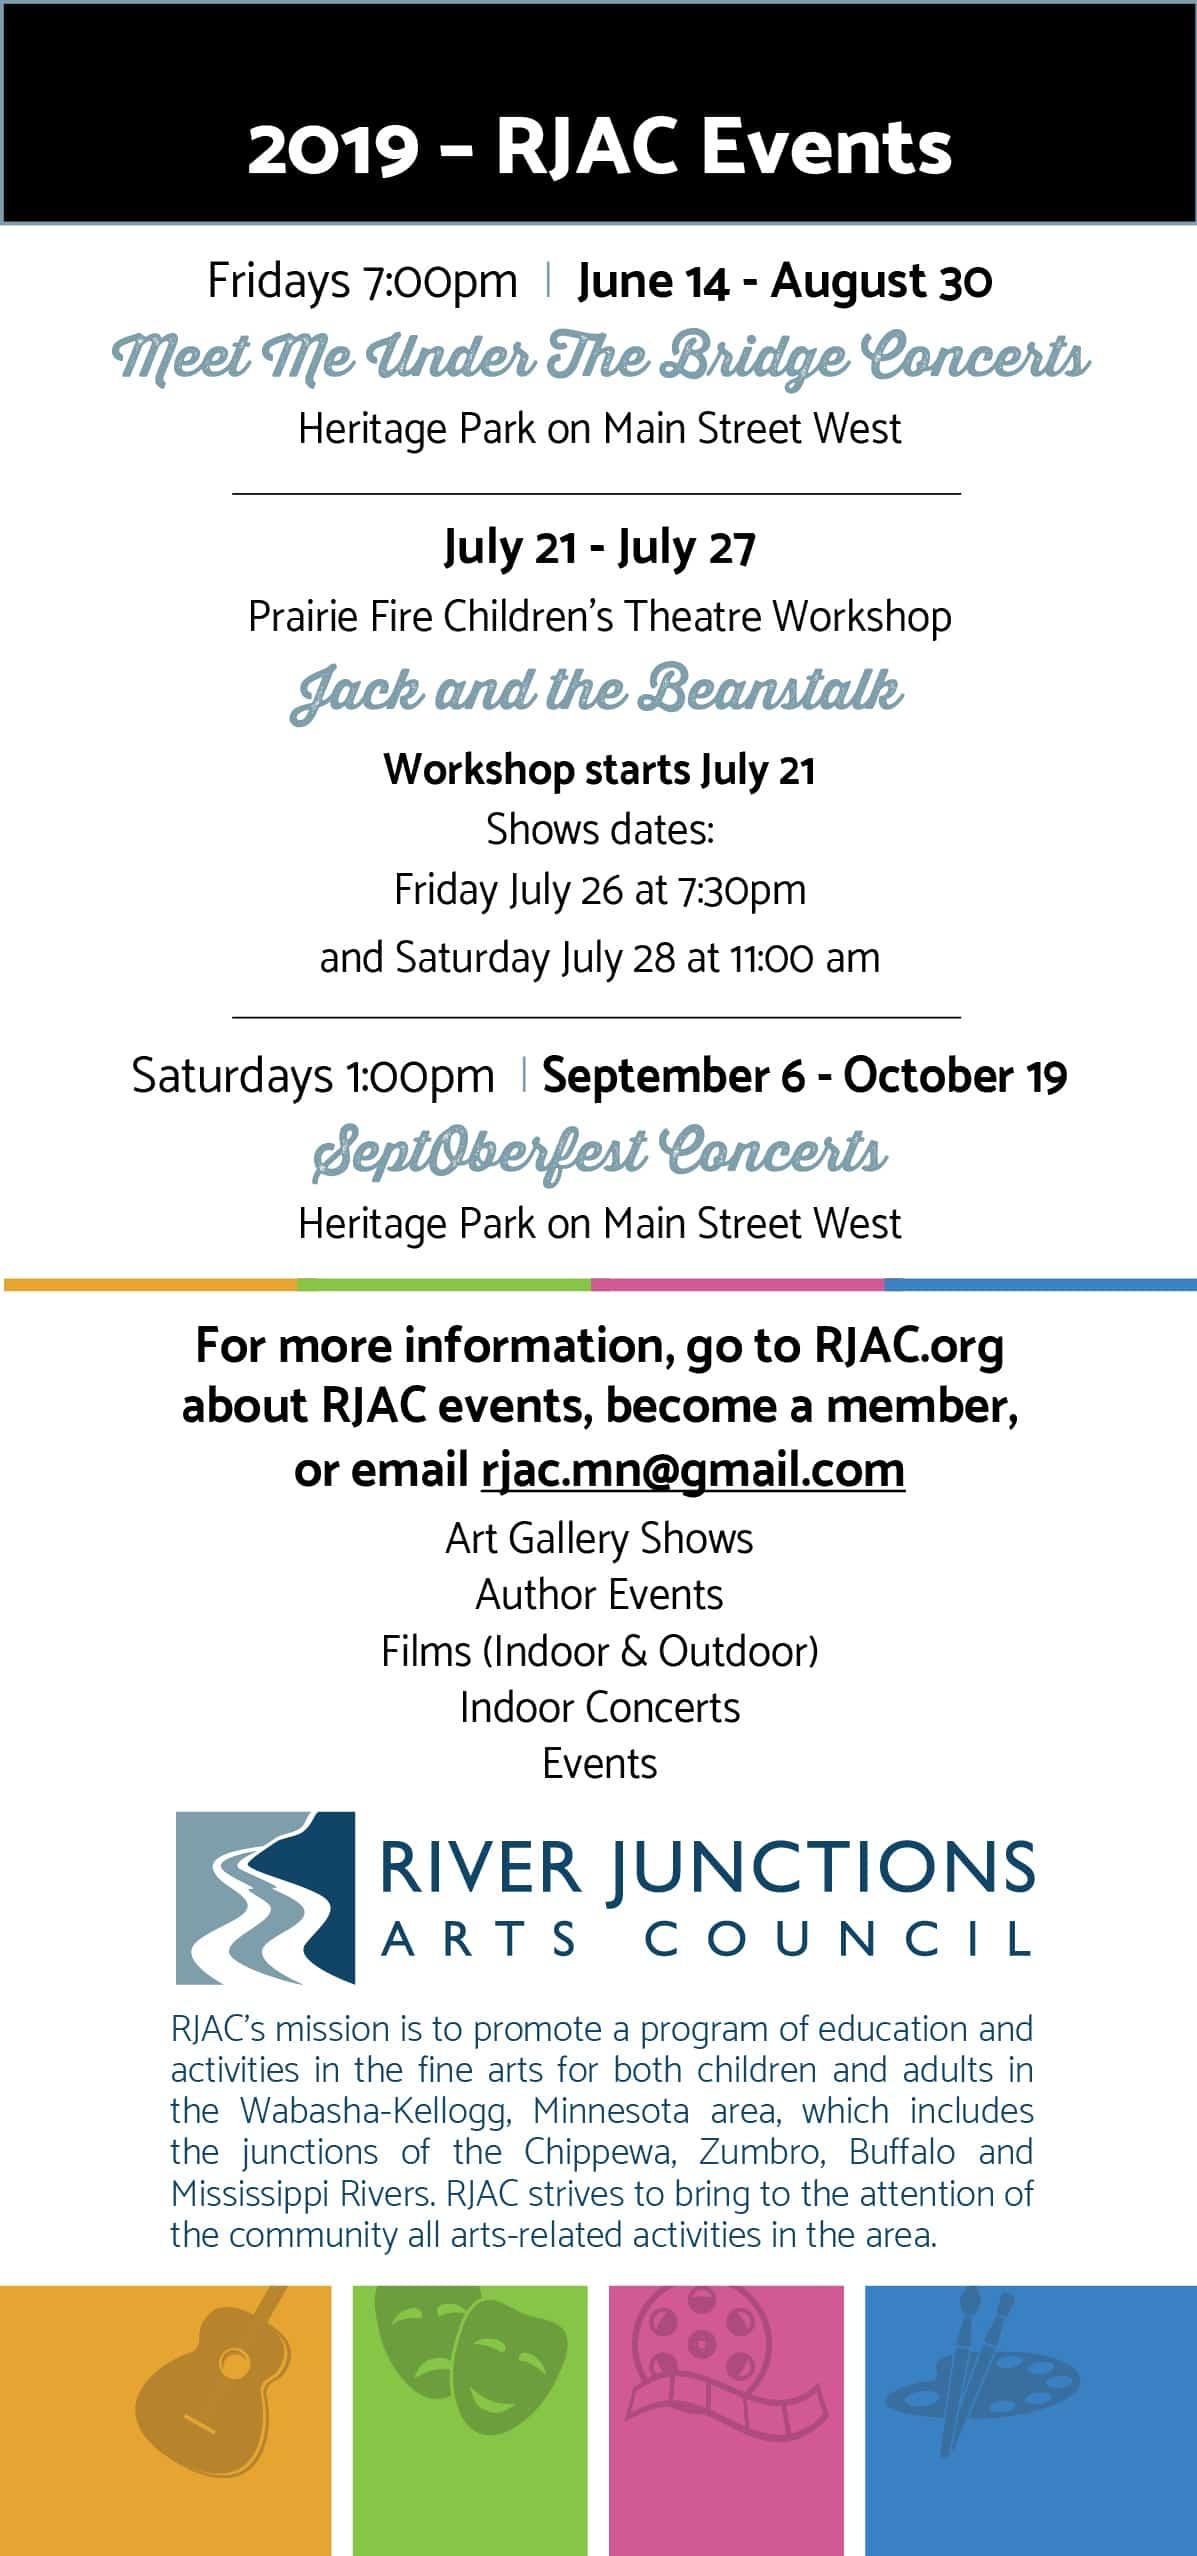 River Junctions Arts Council Concerts & Events 2019